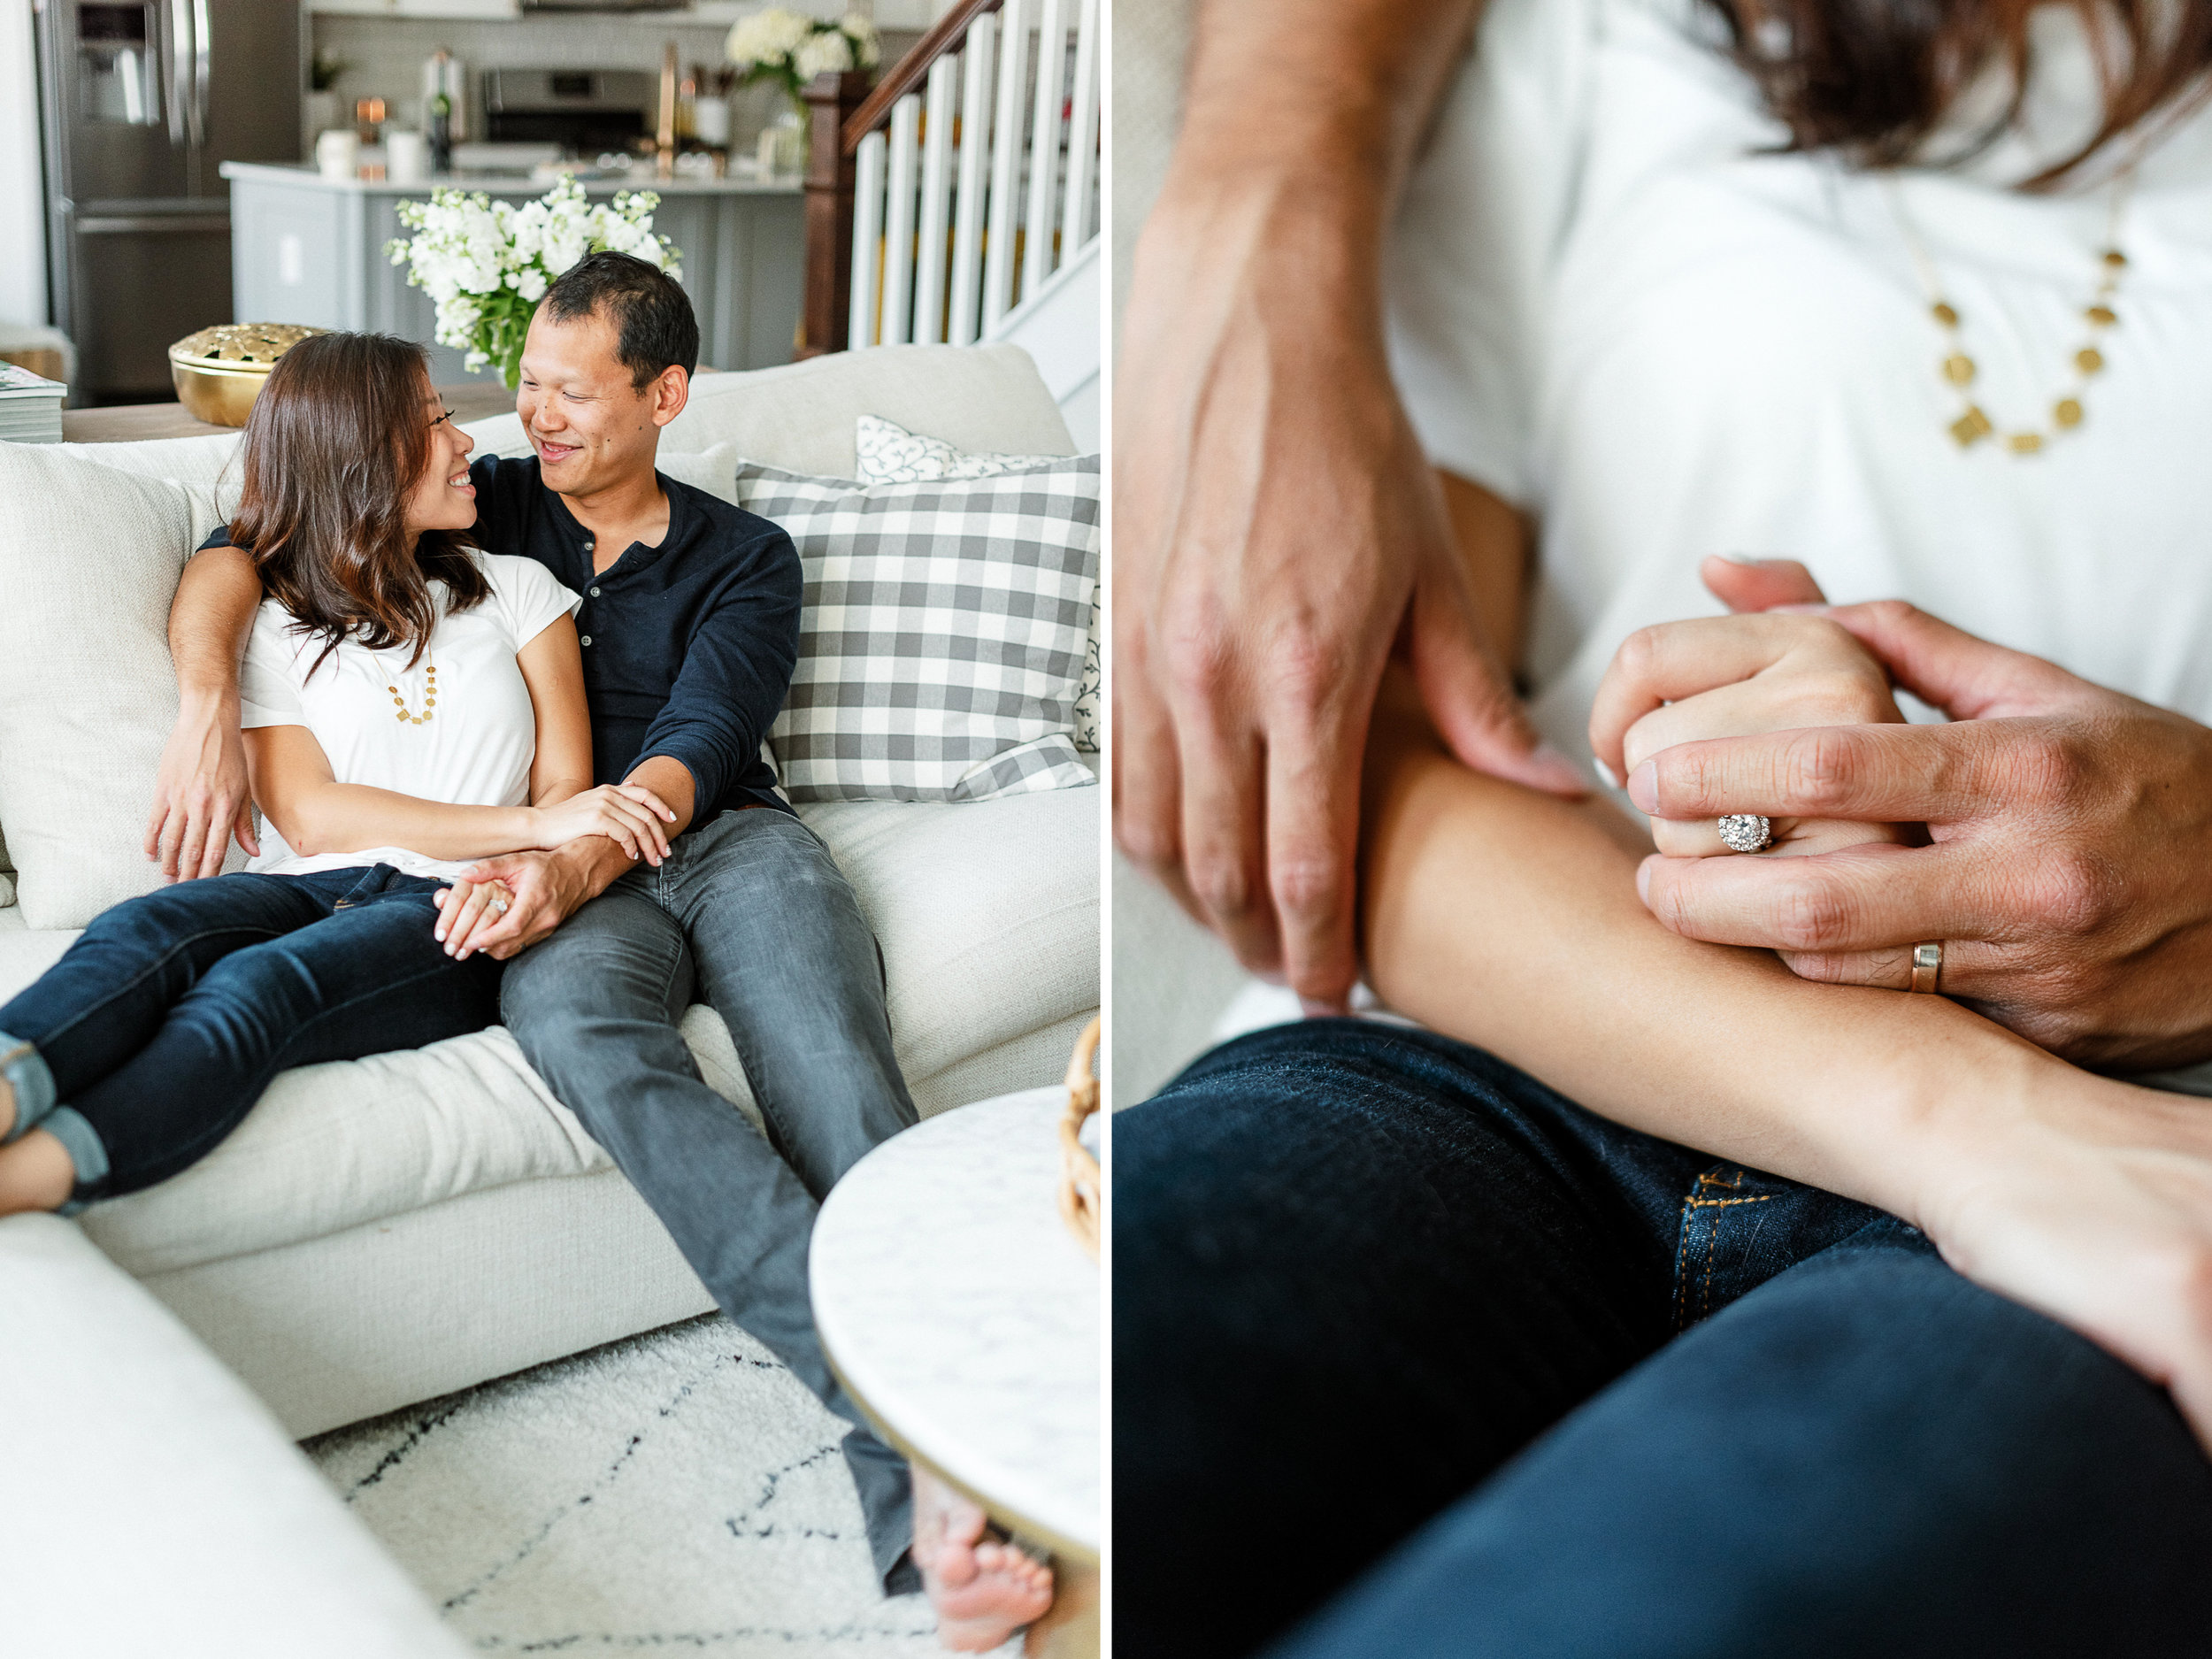 Houston-Wedding-Photographer-Best-Top-Luxury-Destination-Engagements-Portrait-Austin-Photography-113.jpg